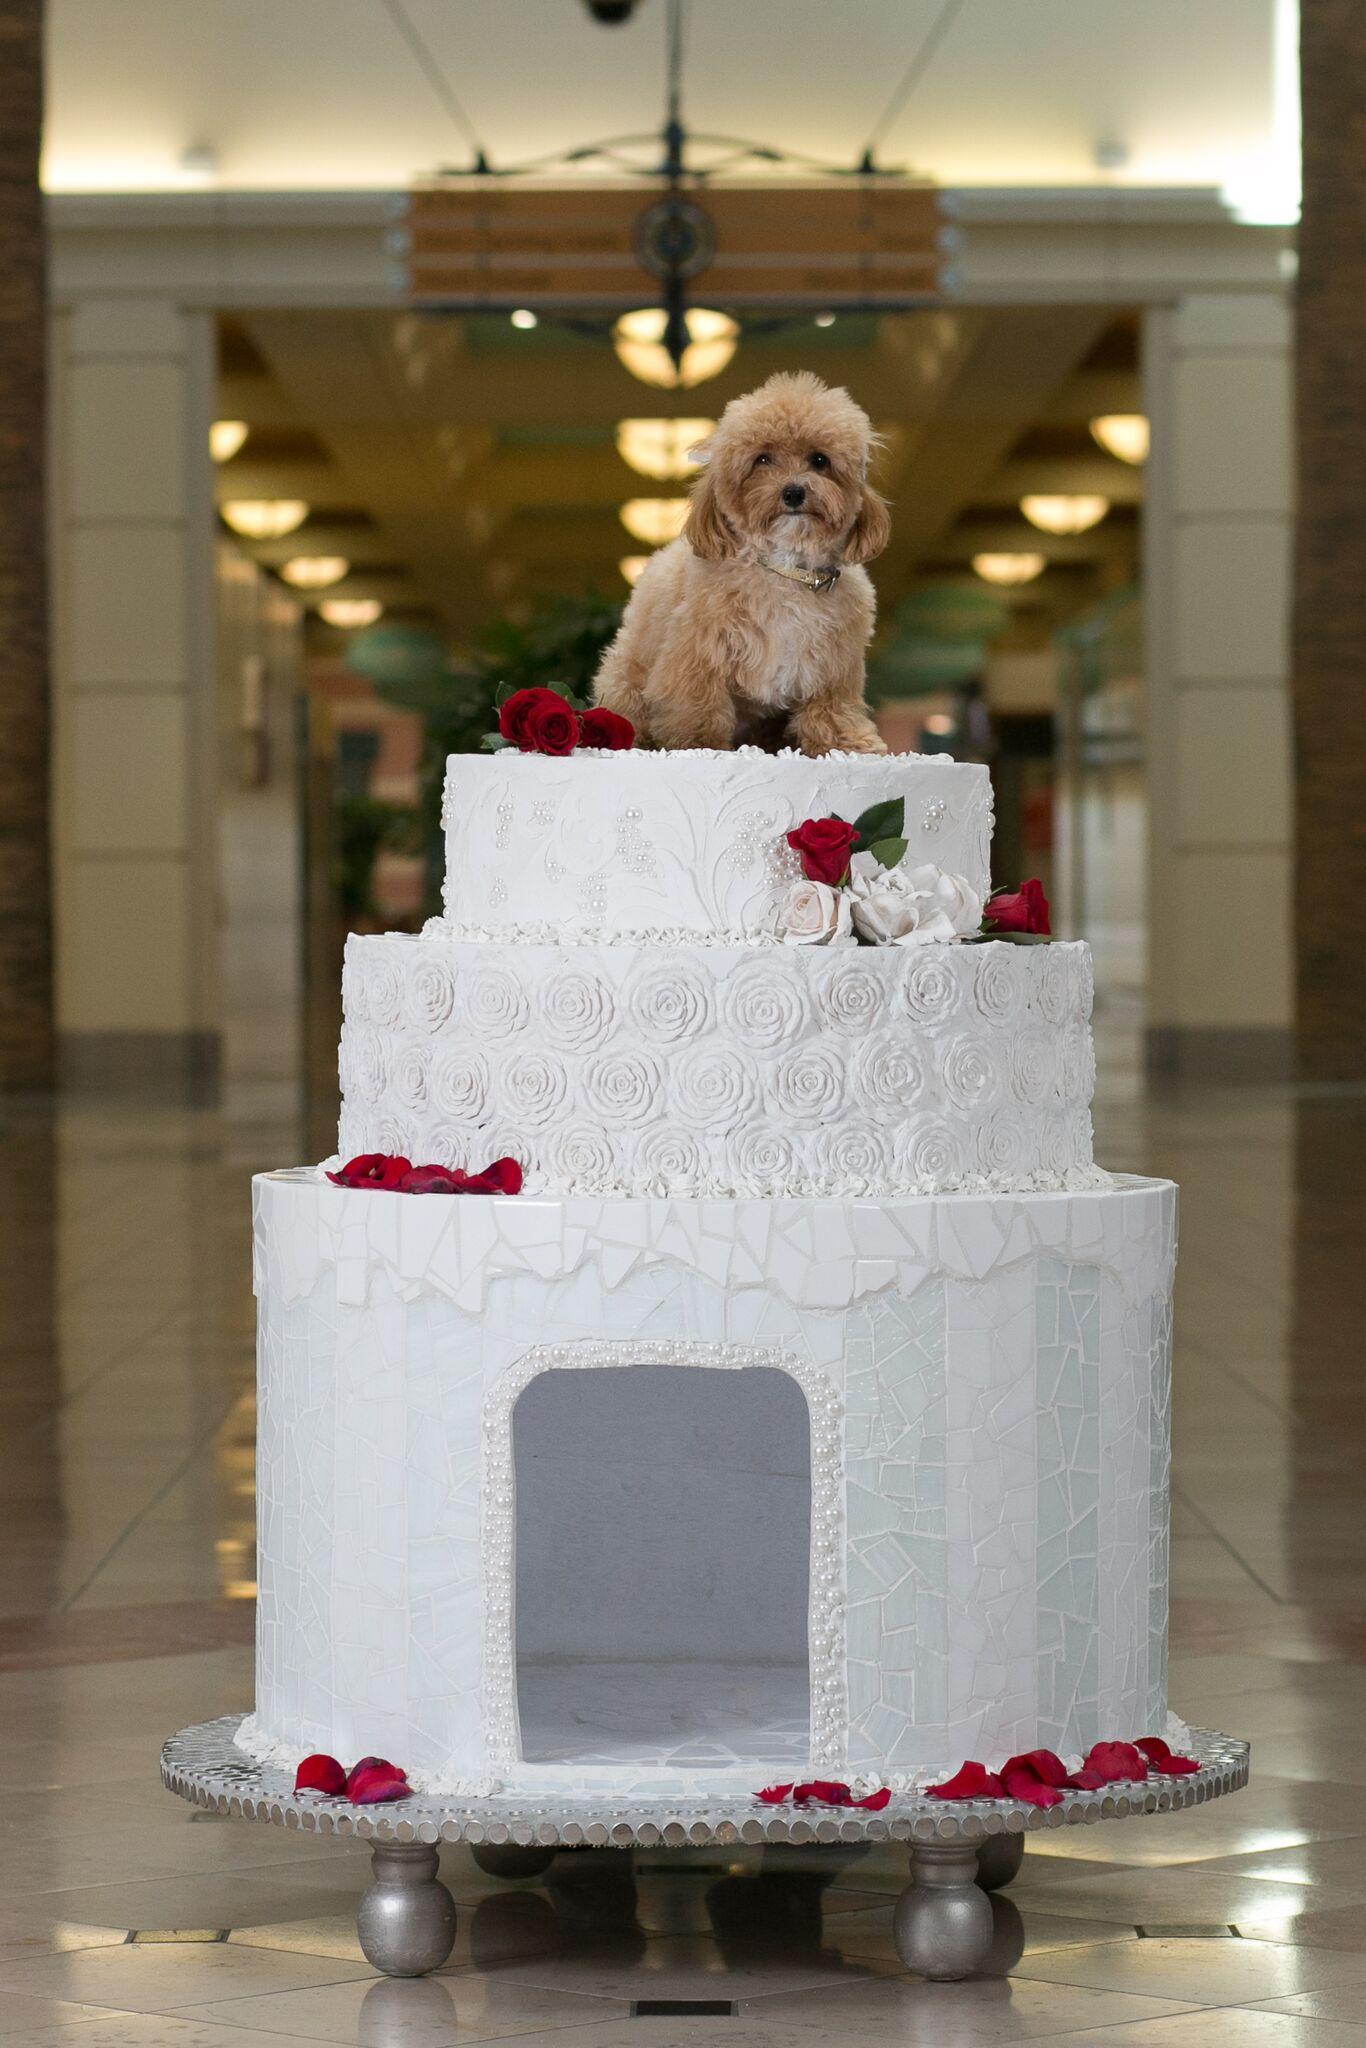 Jeff Monsein - The Royal Wedding Cake House - Image 4 of 9